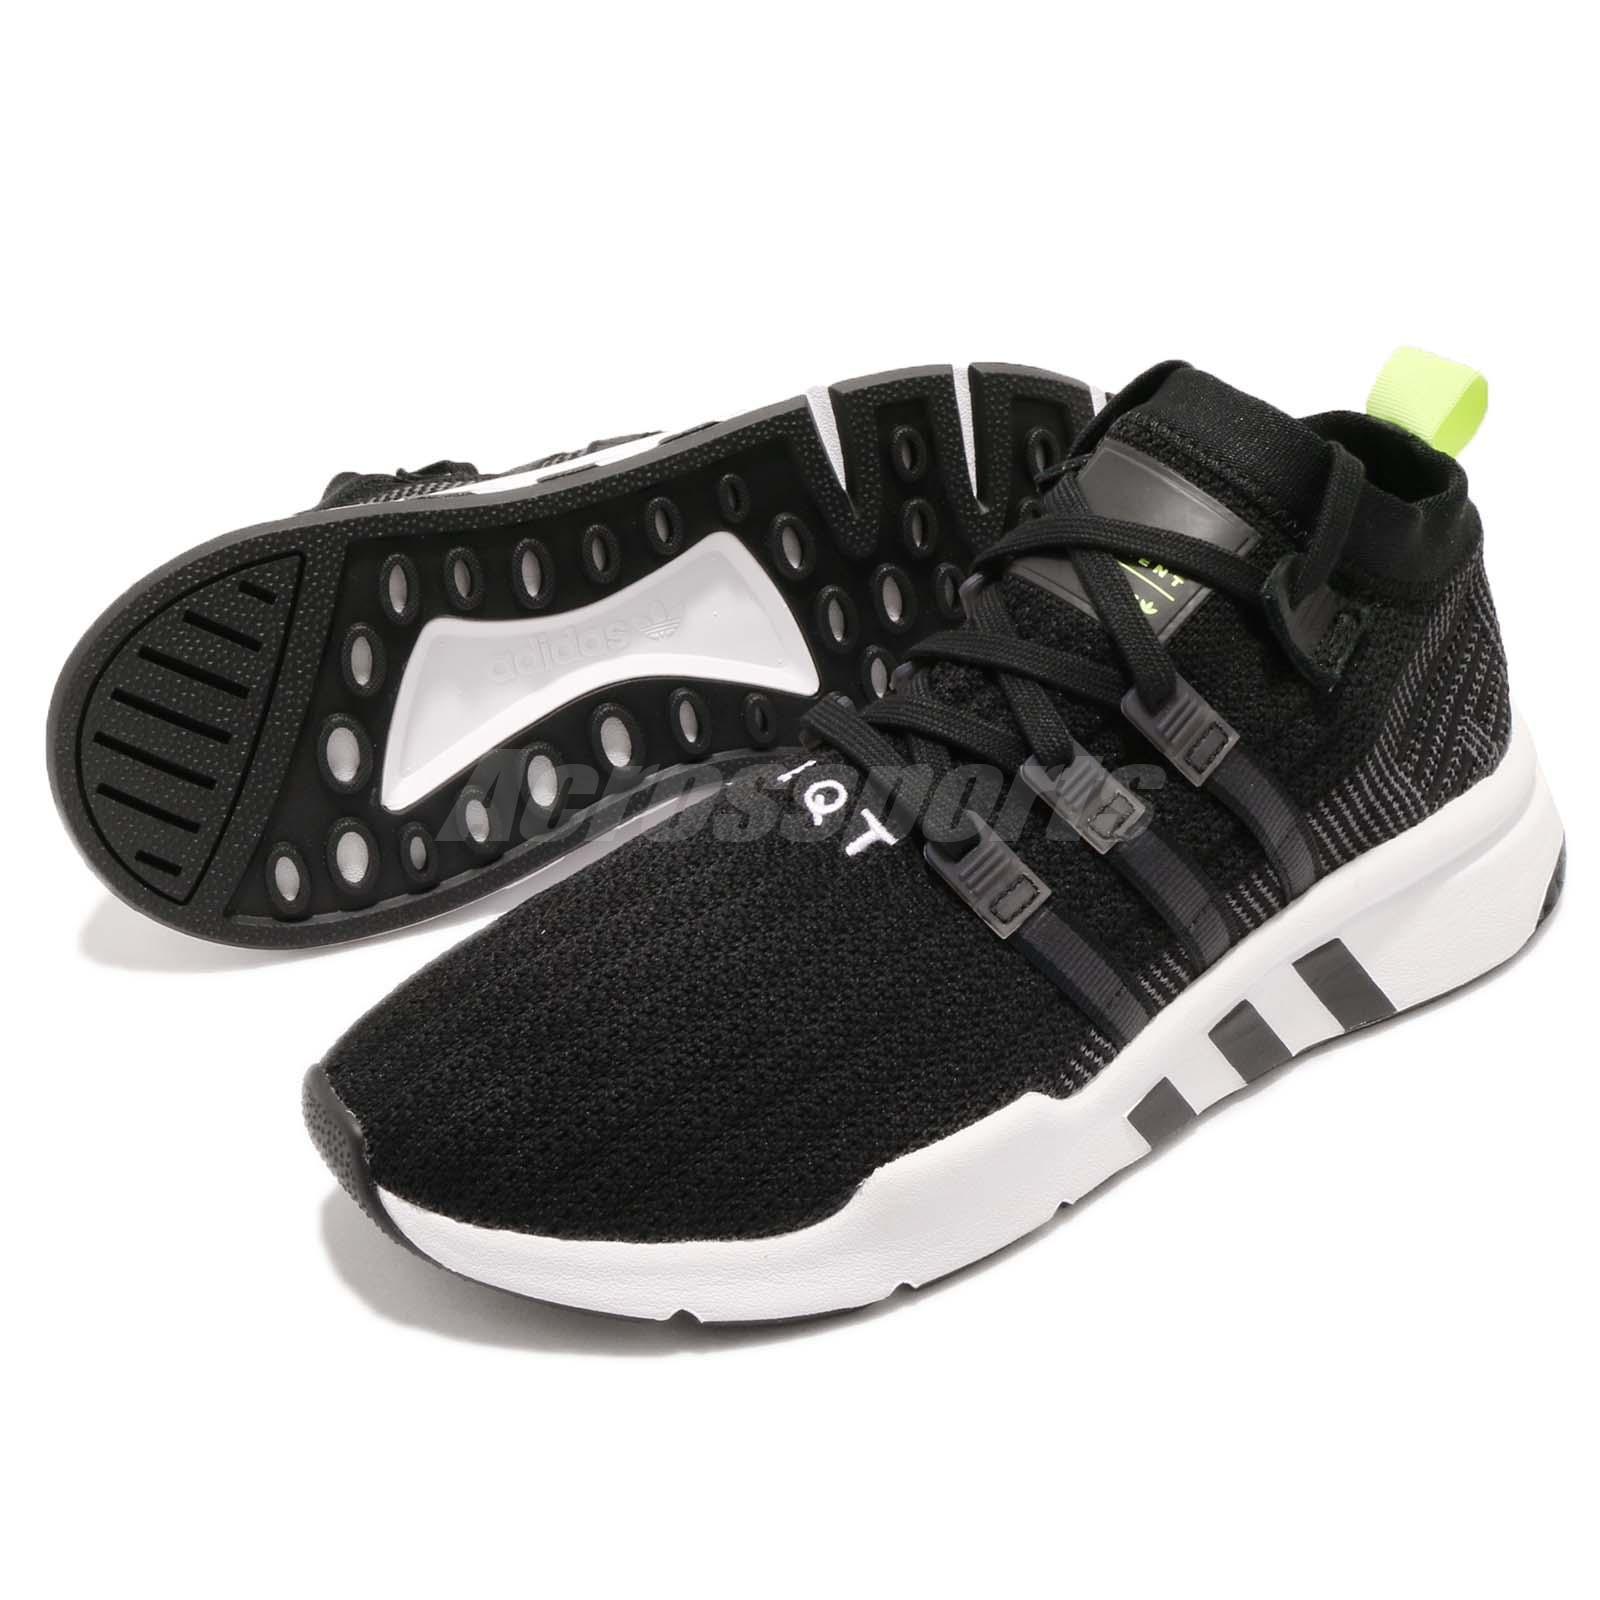 info for 11190 5b606 Details about adidas Originals EQT Support Mid ADV PK Primeknit Black White  Men Shoes B37435